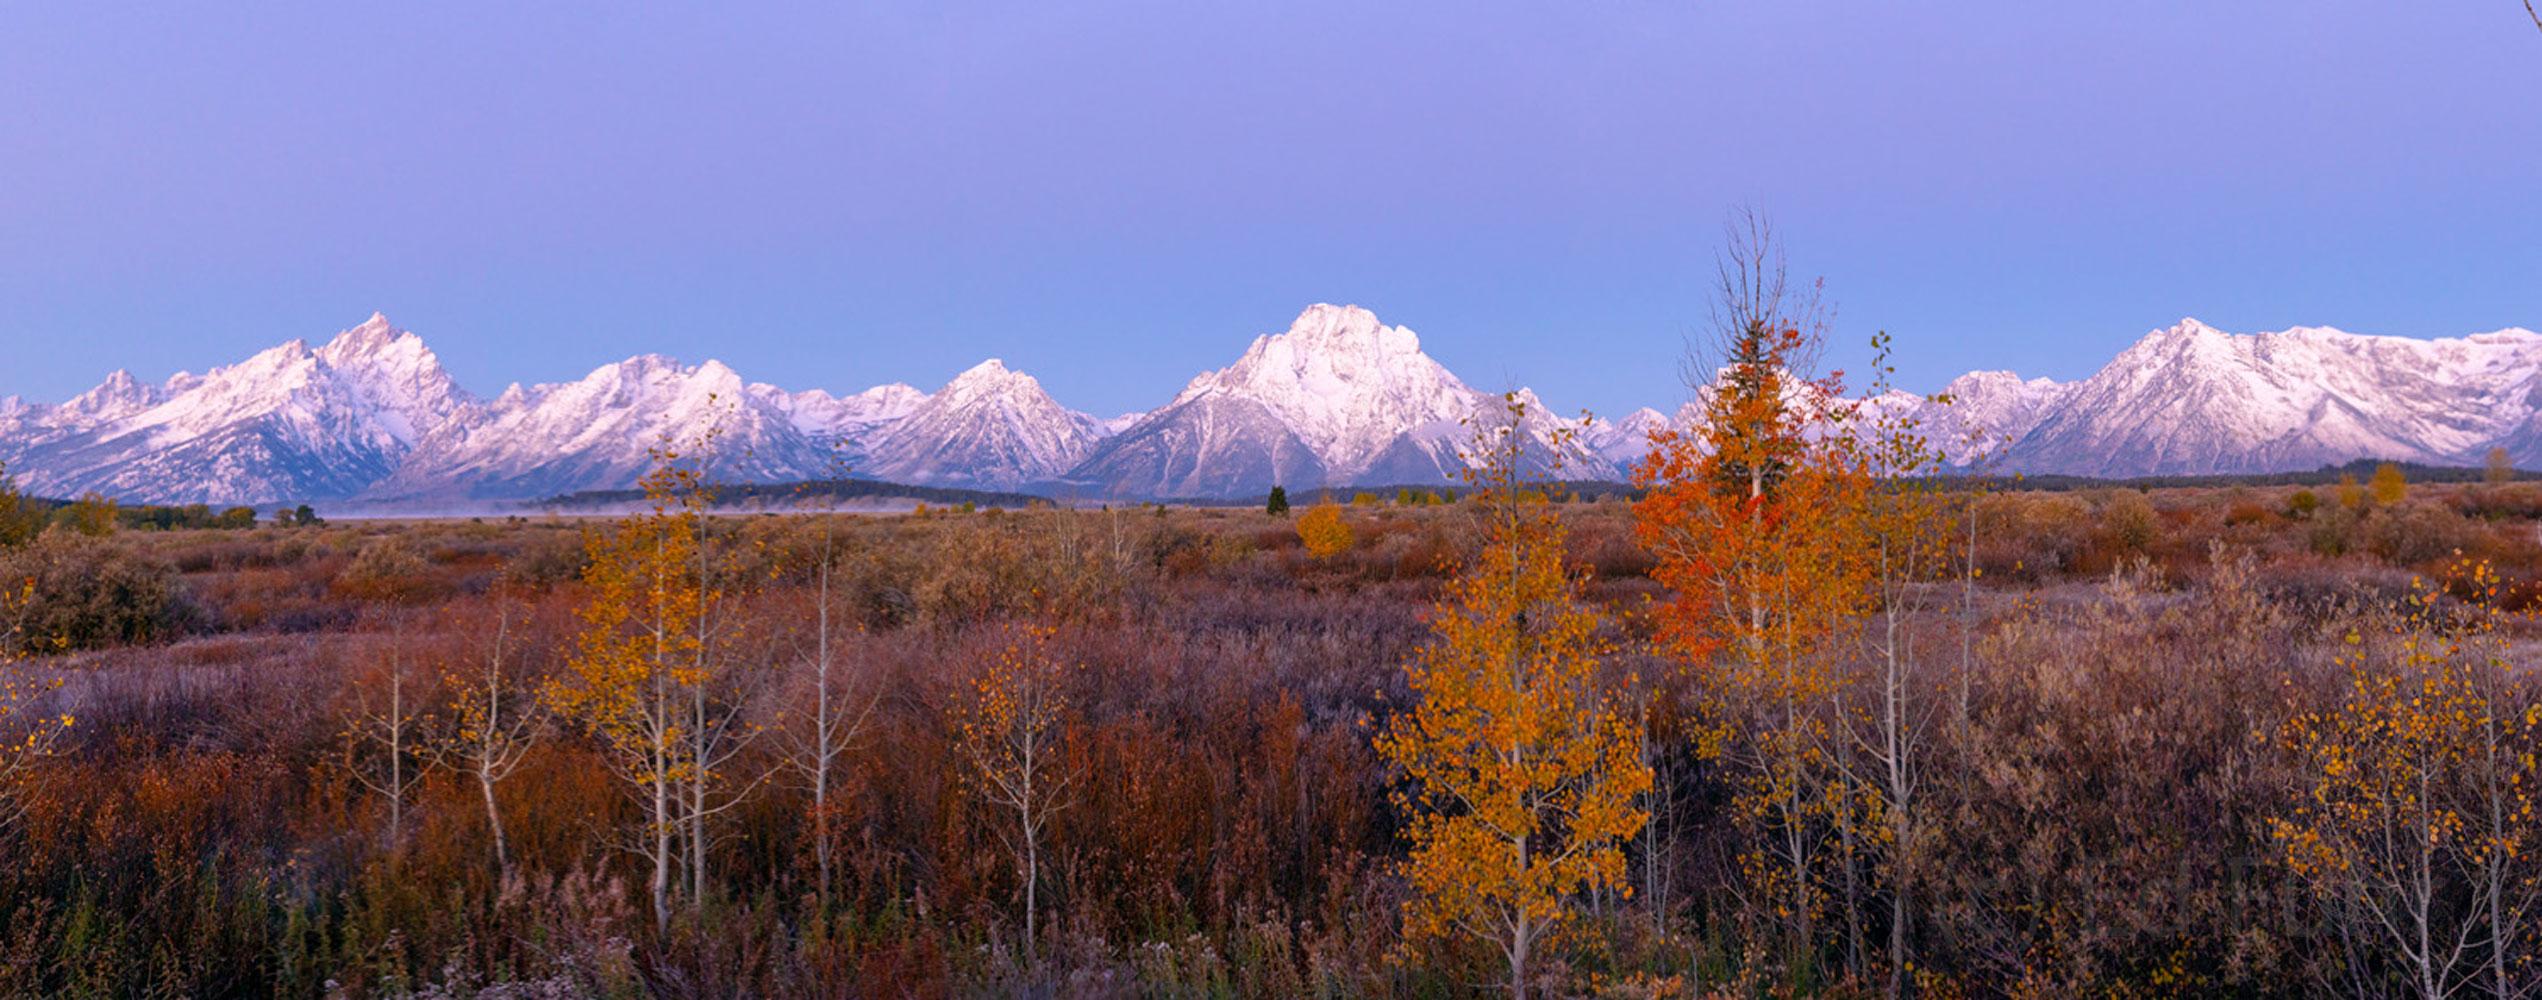 willow flat, autumn, sunrise, Tetons, Grand Teton, photo